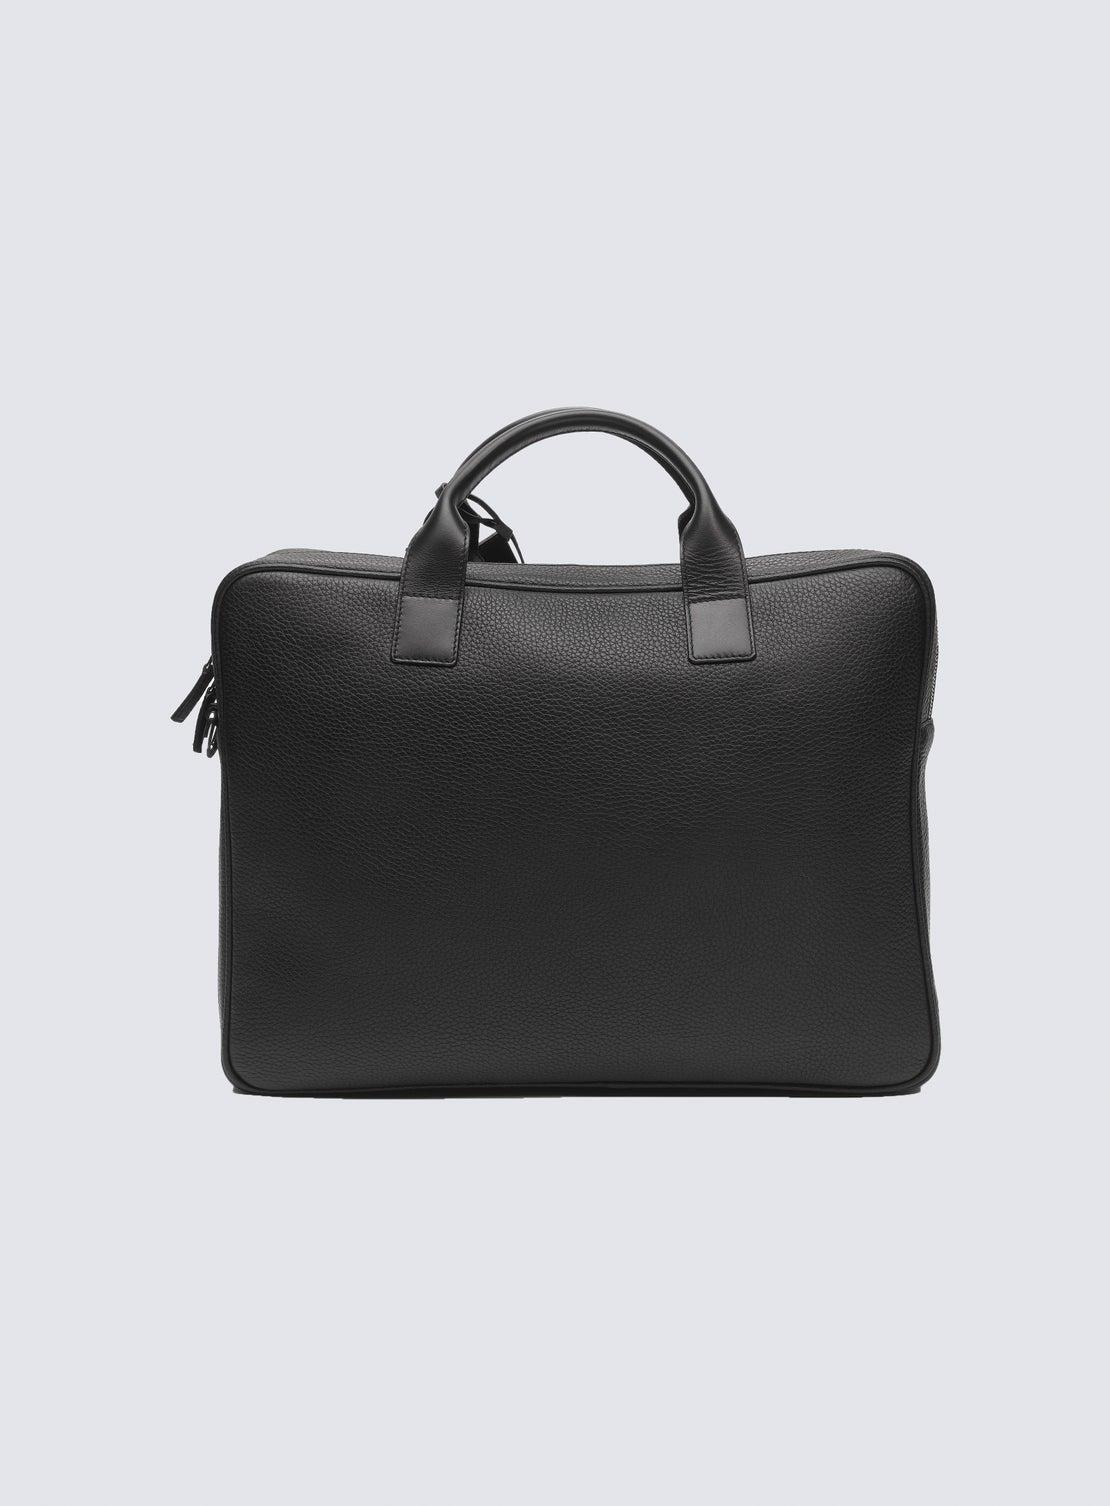 Leather Attaché Case